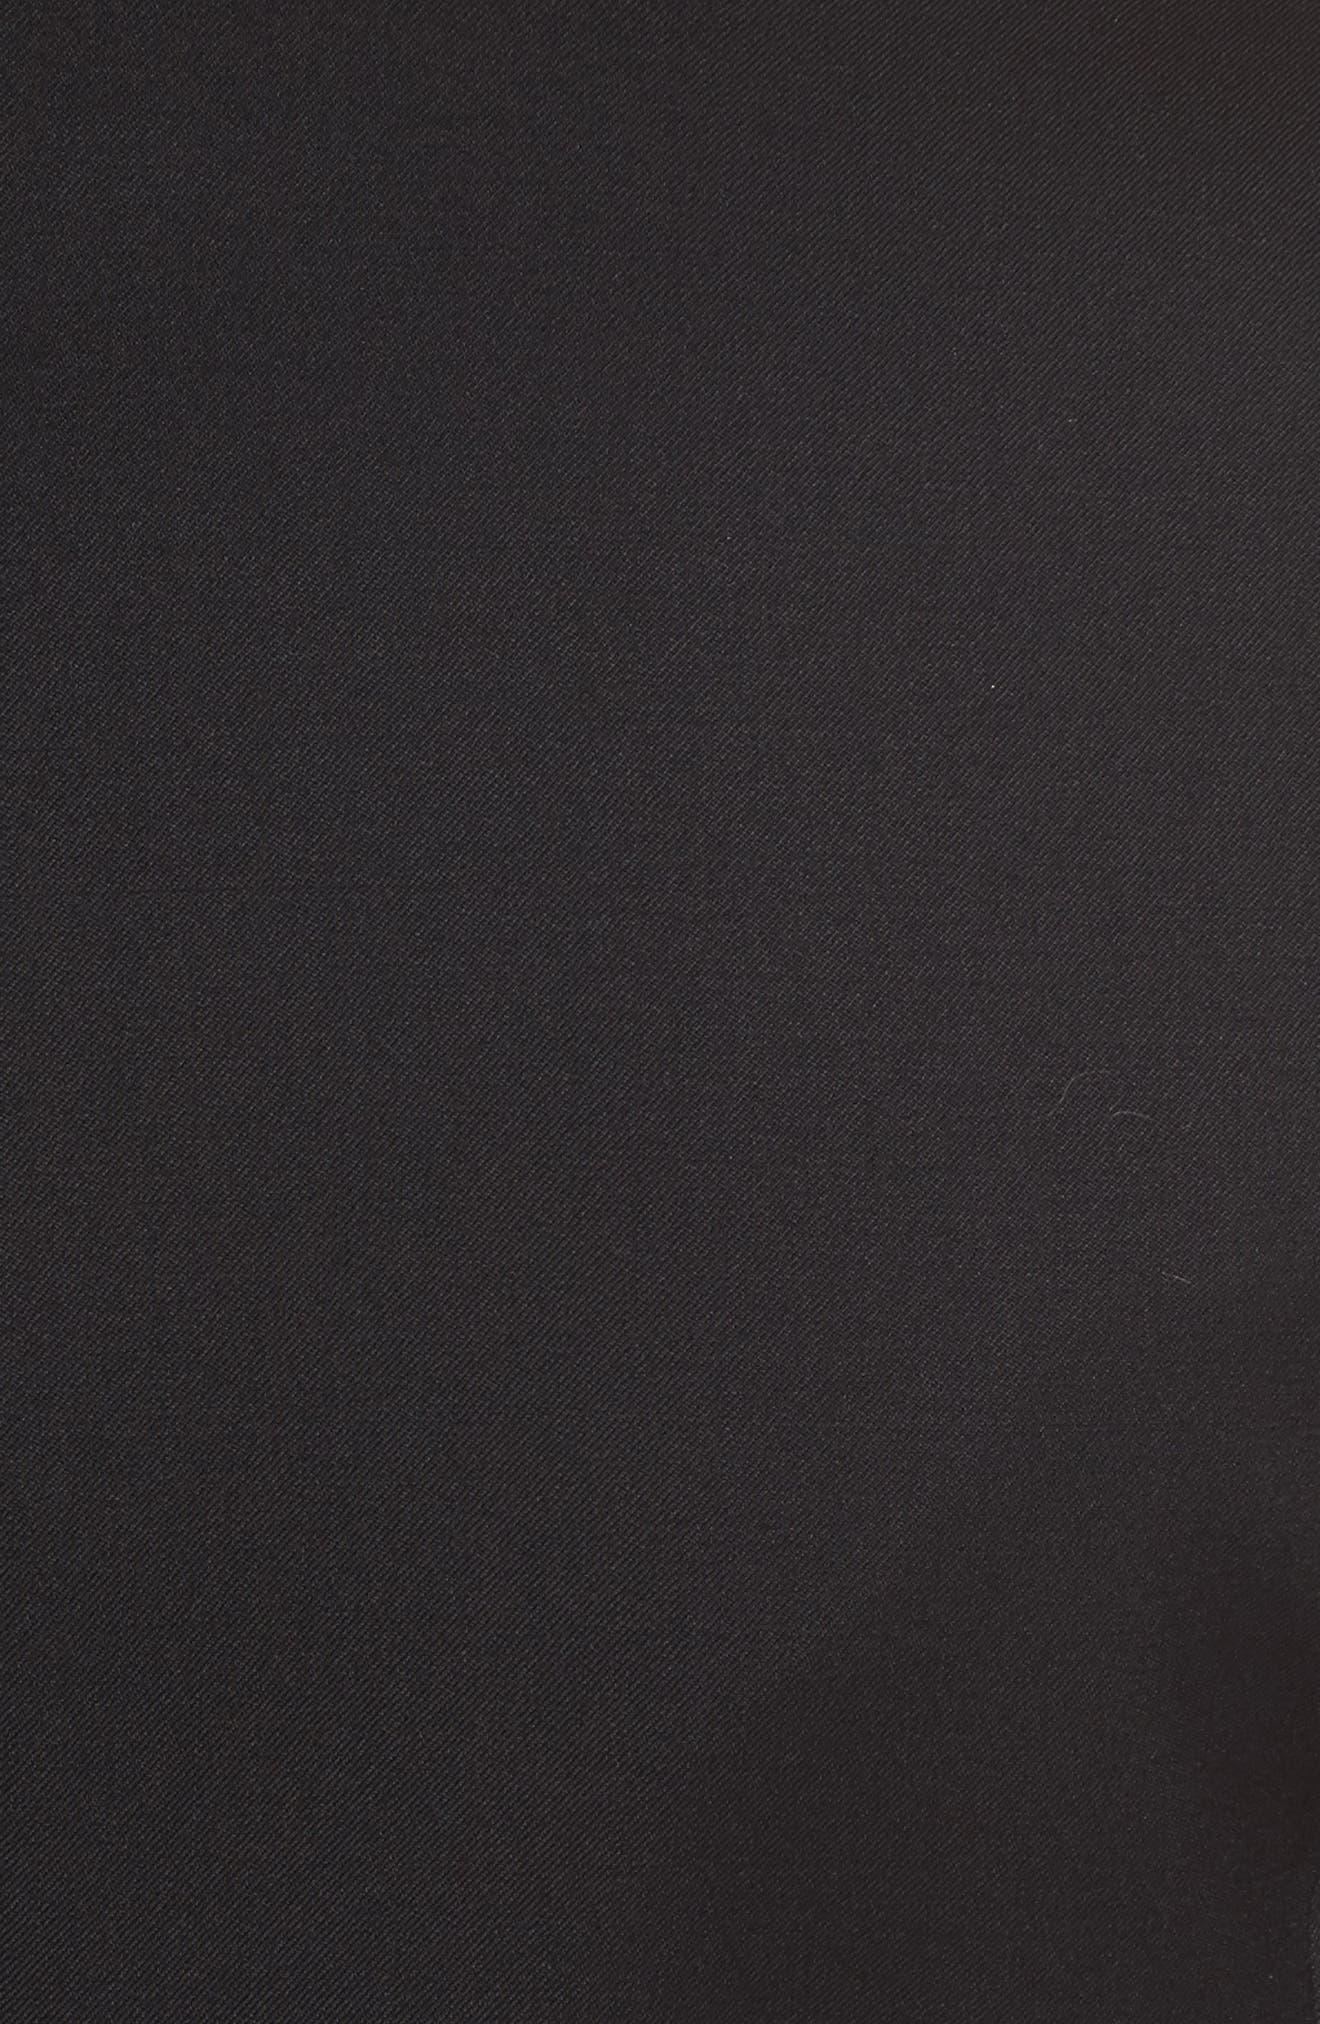 Tuxedo Detail Wool Suit Jacket,                             Alternate thumbnail 6, color,                             Black